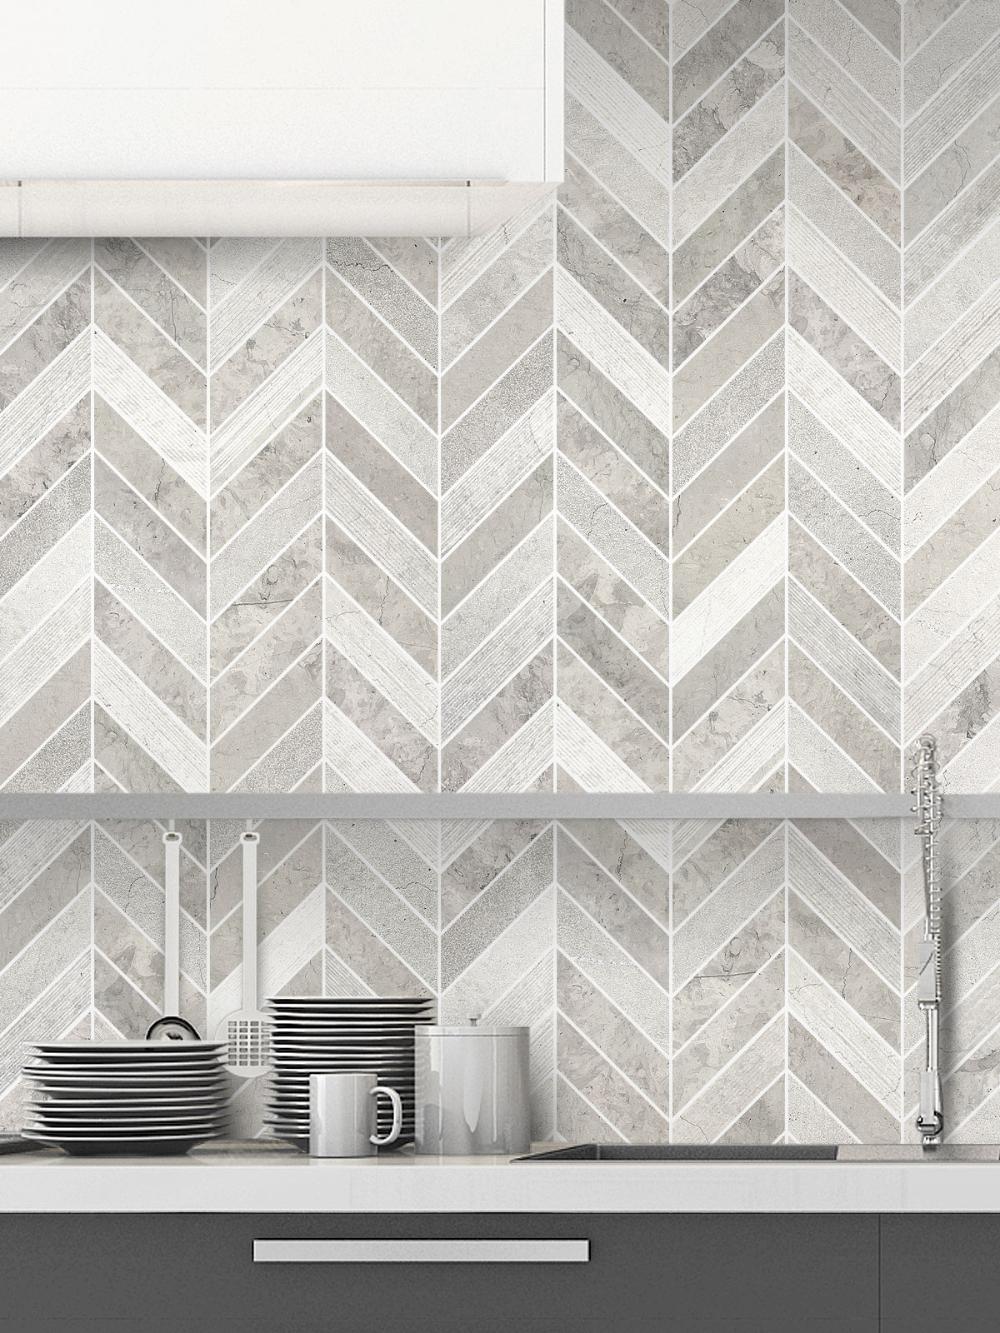 Gray Modern Limestone Chevron Backsplash Tile Backsplash Com In 2020 Bathroom Tile Designs Tile Backsplash Mosaic Backsplash Bathroom